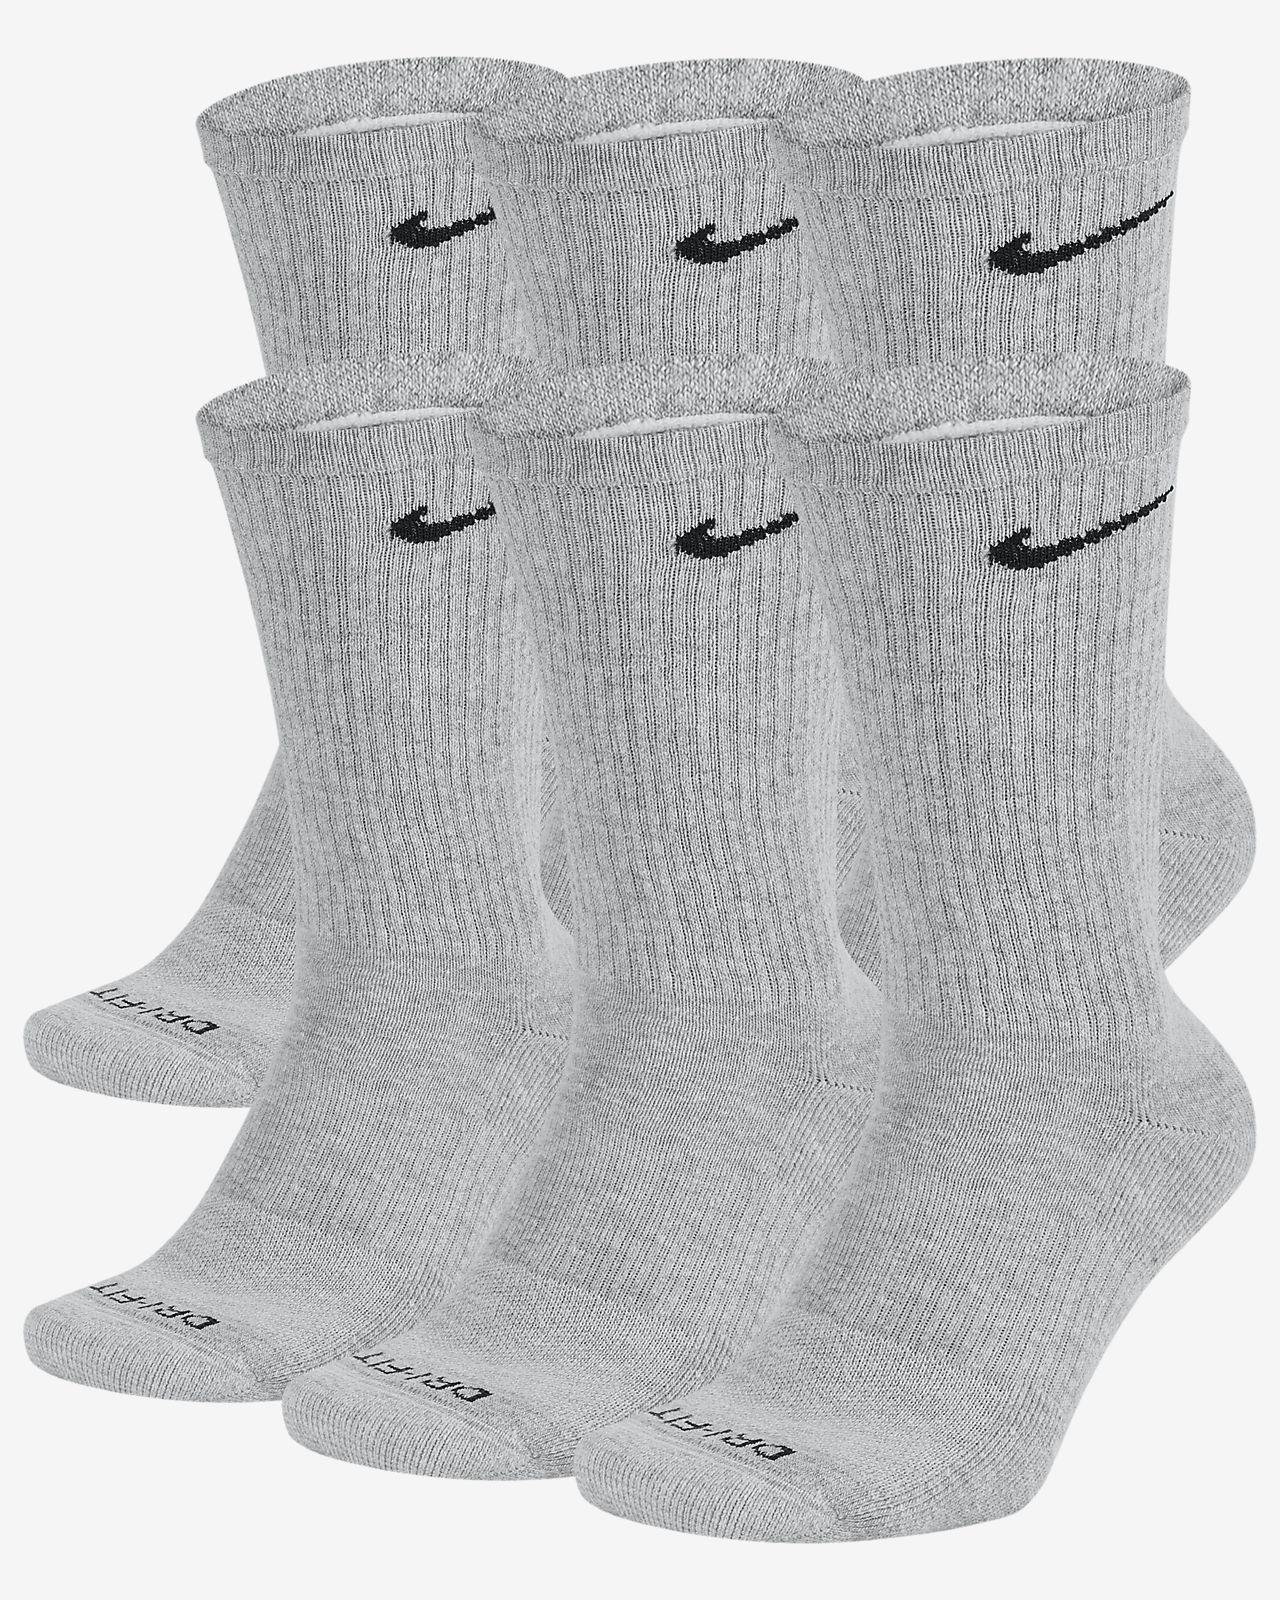 b3261a402474d Nike Everyday Plus Cushion Crew Training Socks (6 Pair)